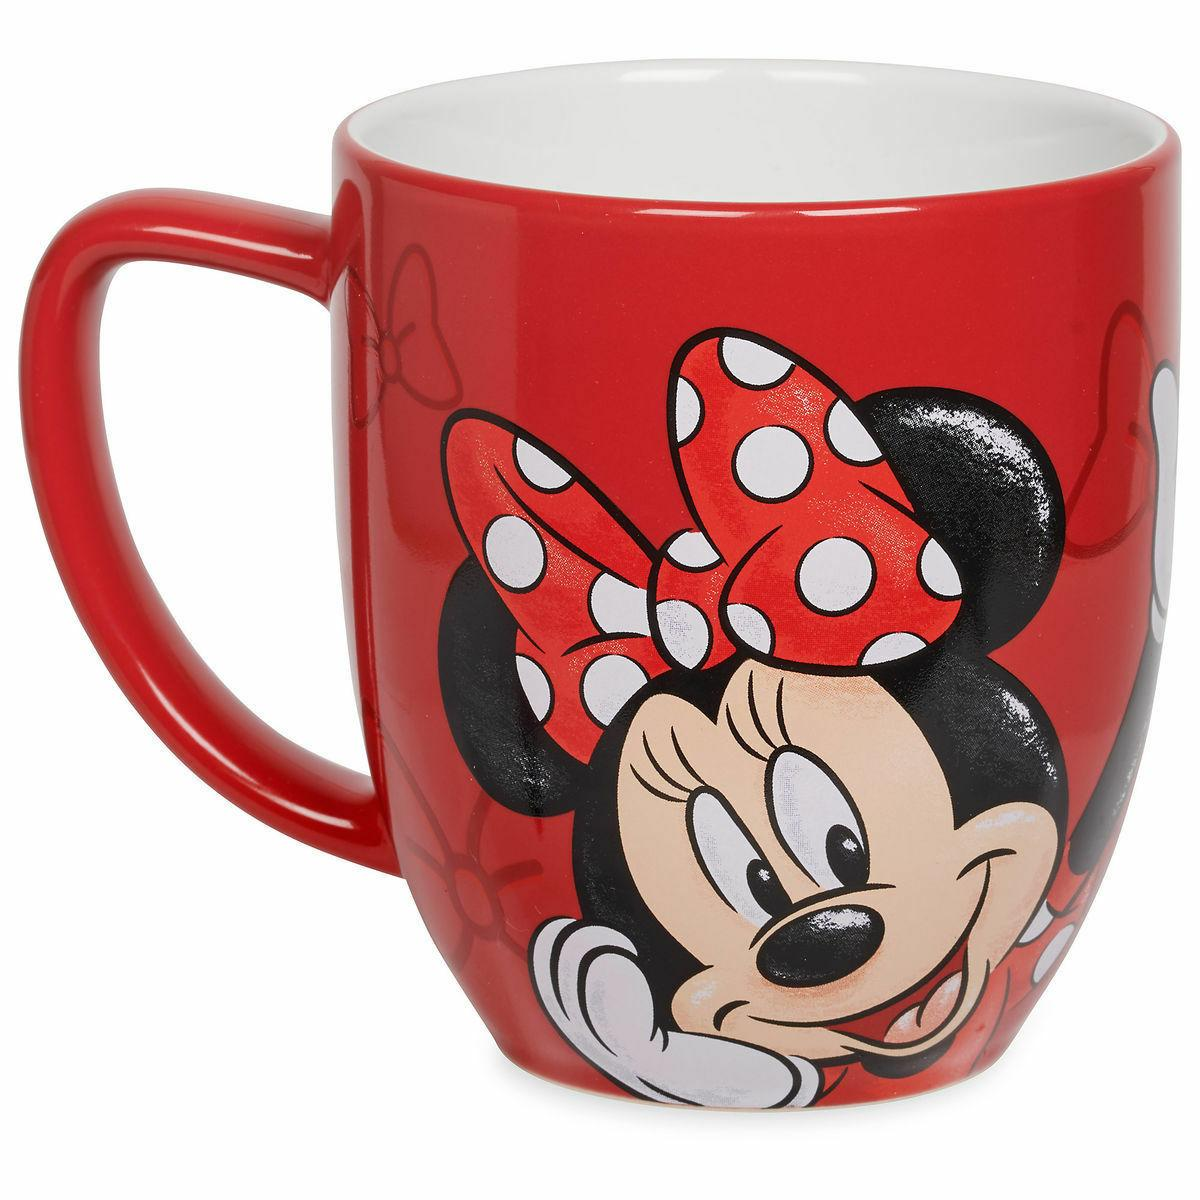 Disney Store Minnie Mouse Coffee Mug 12 oz Microwave & Dishw